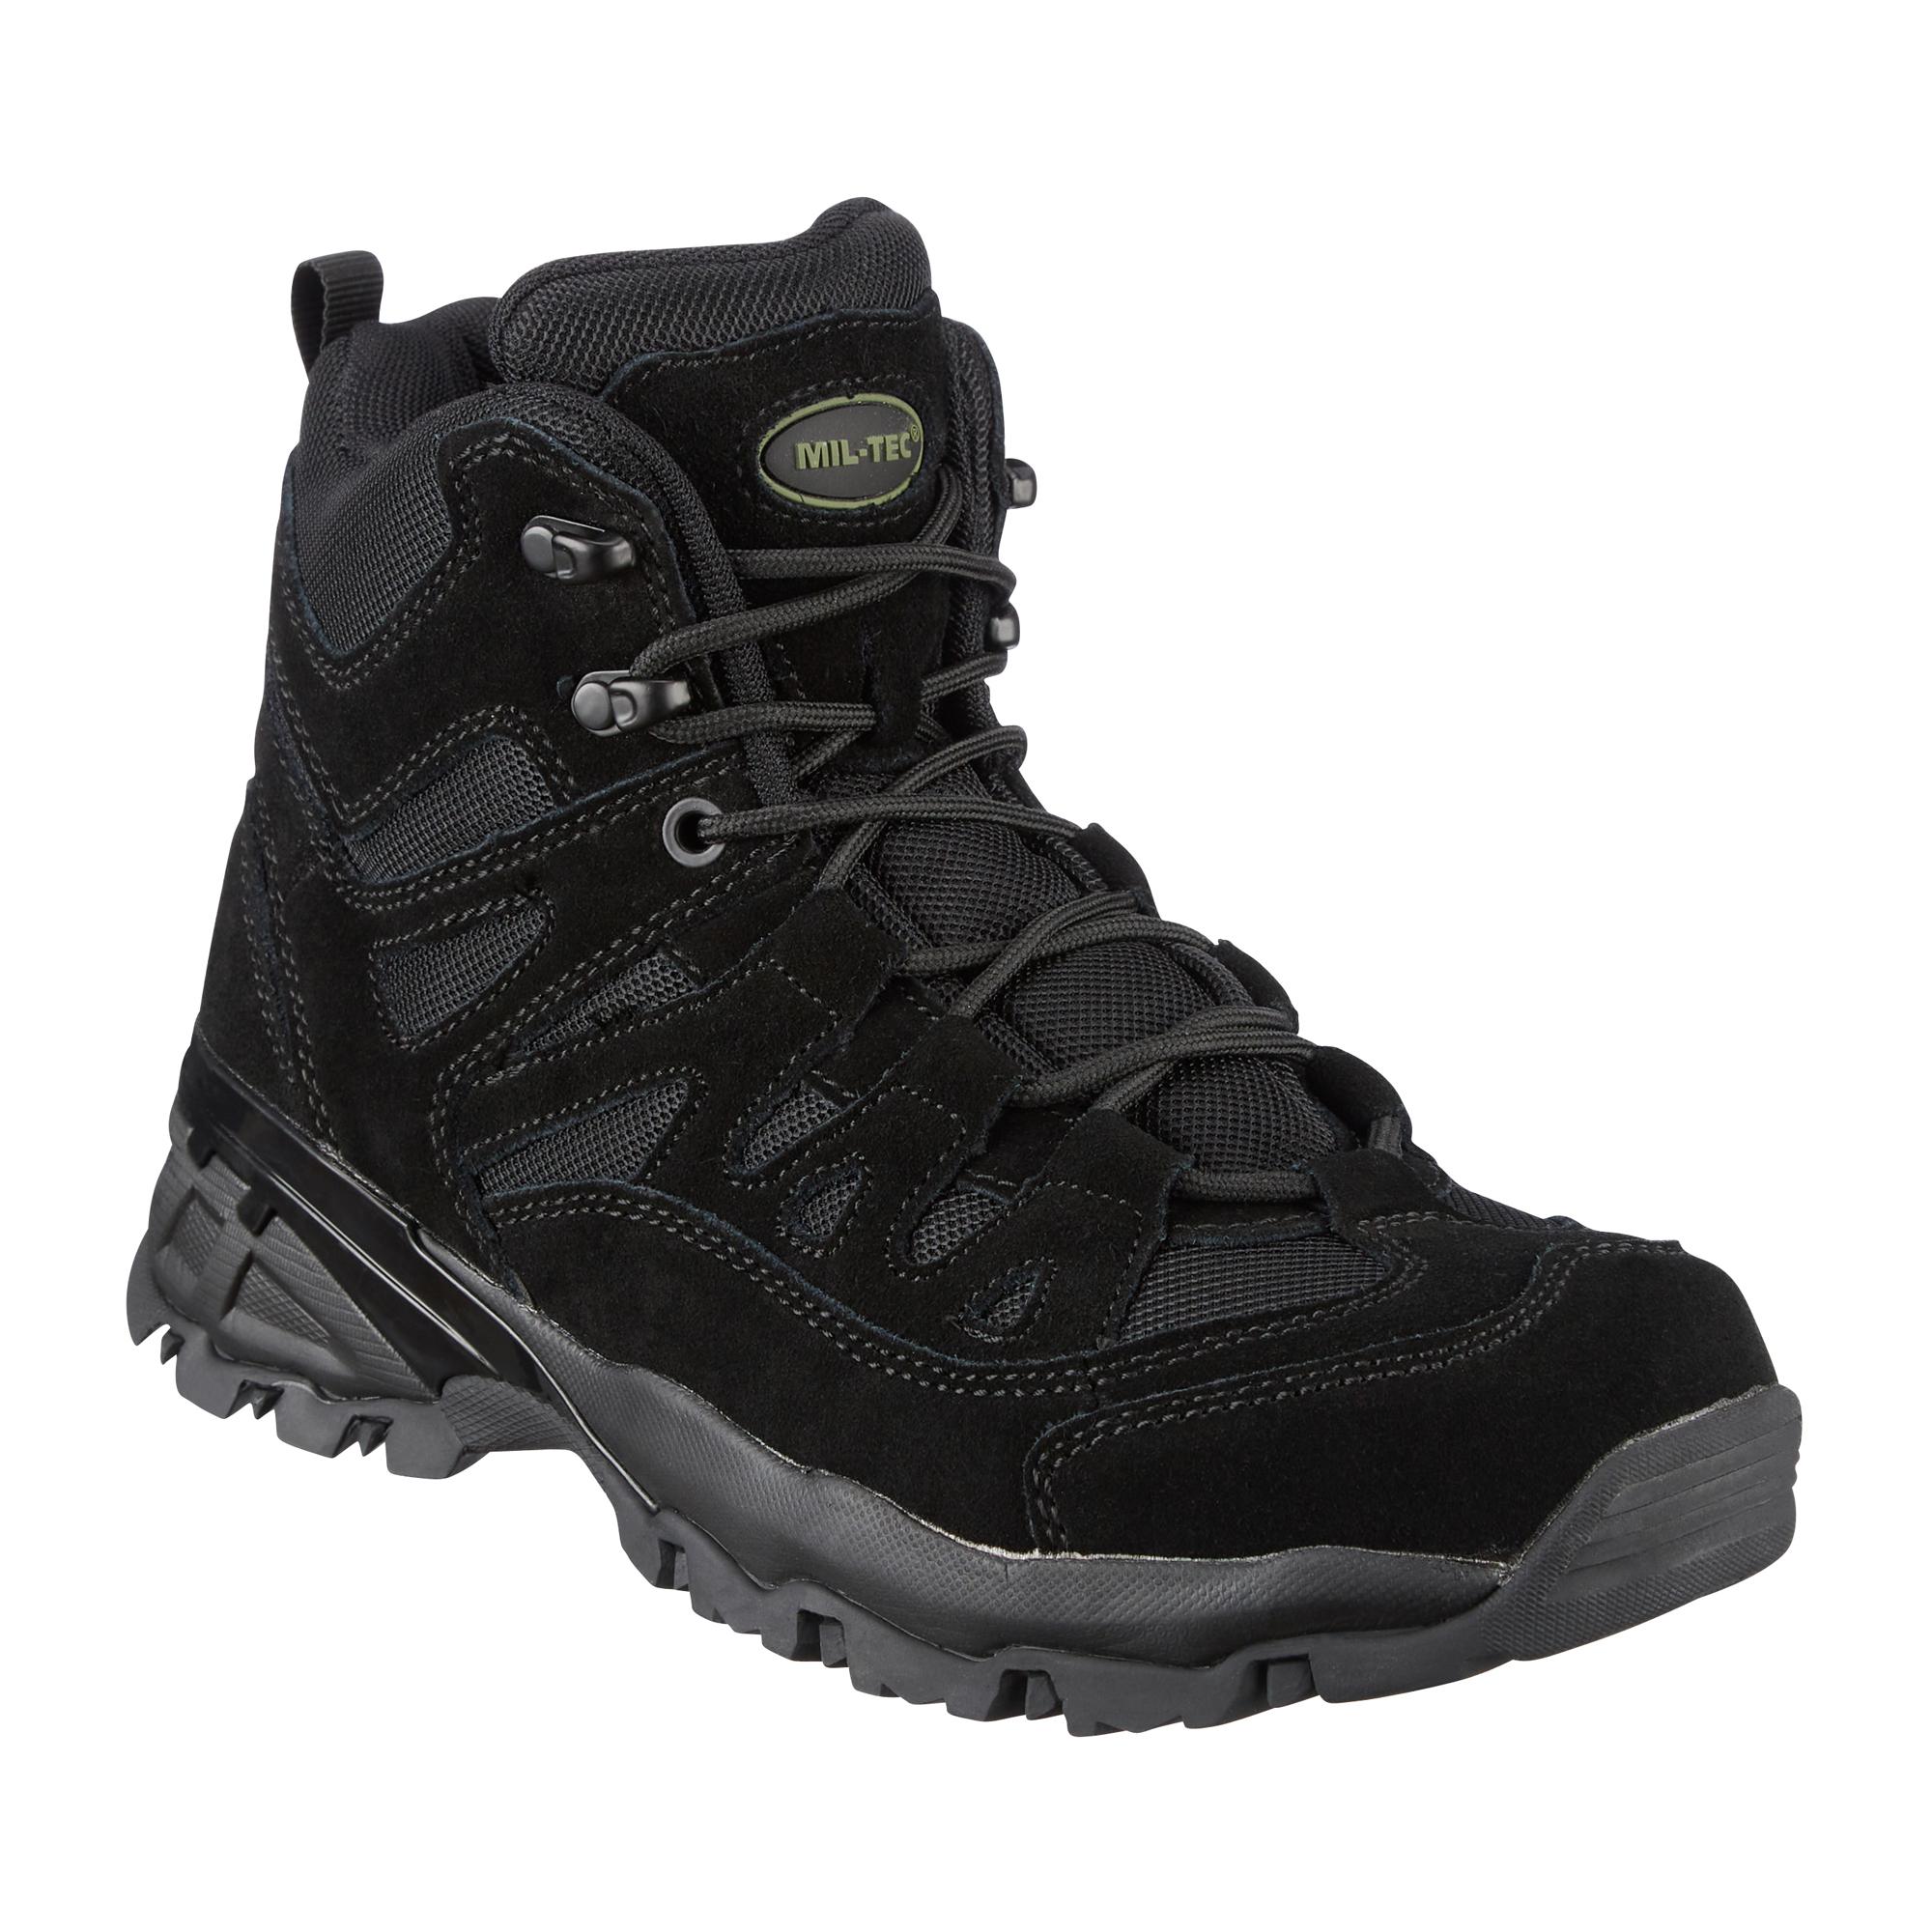 Stiefel Paratrooper Mil-Tec schwarz